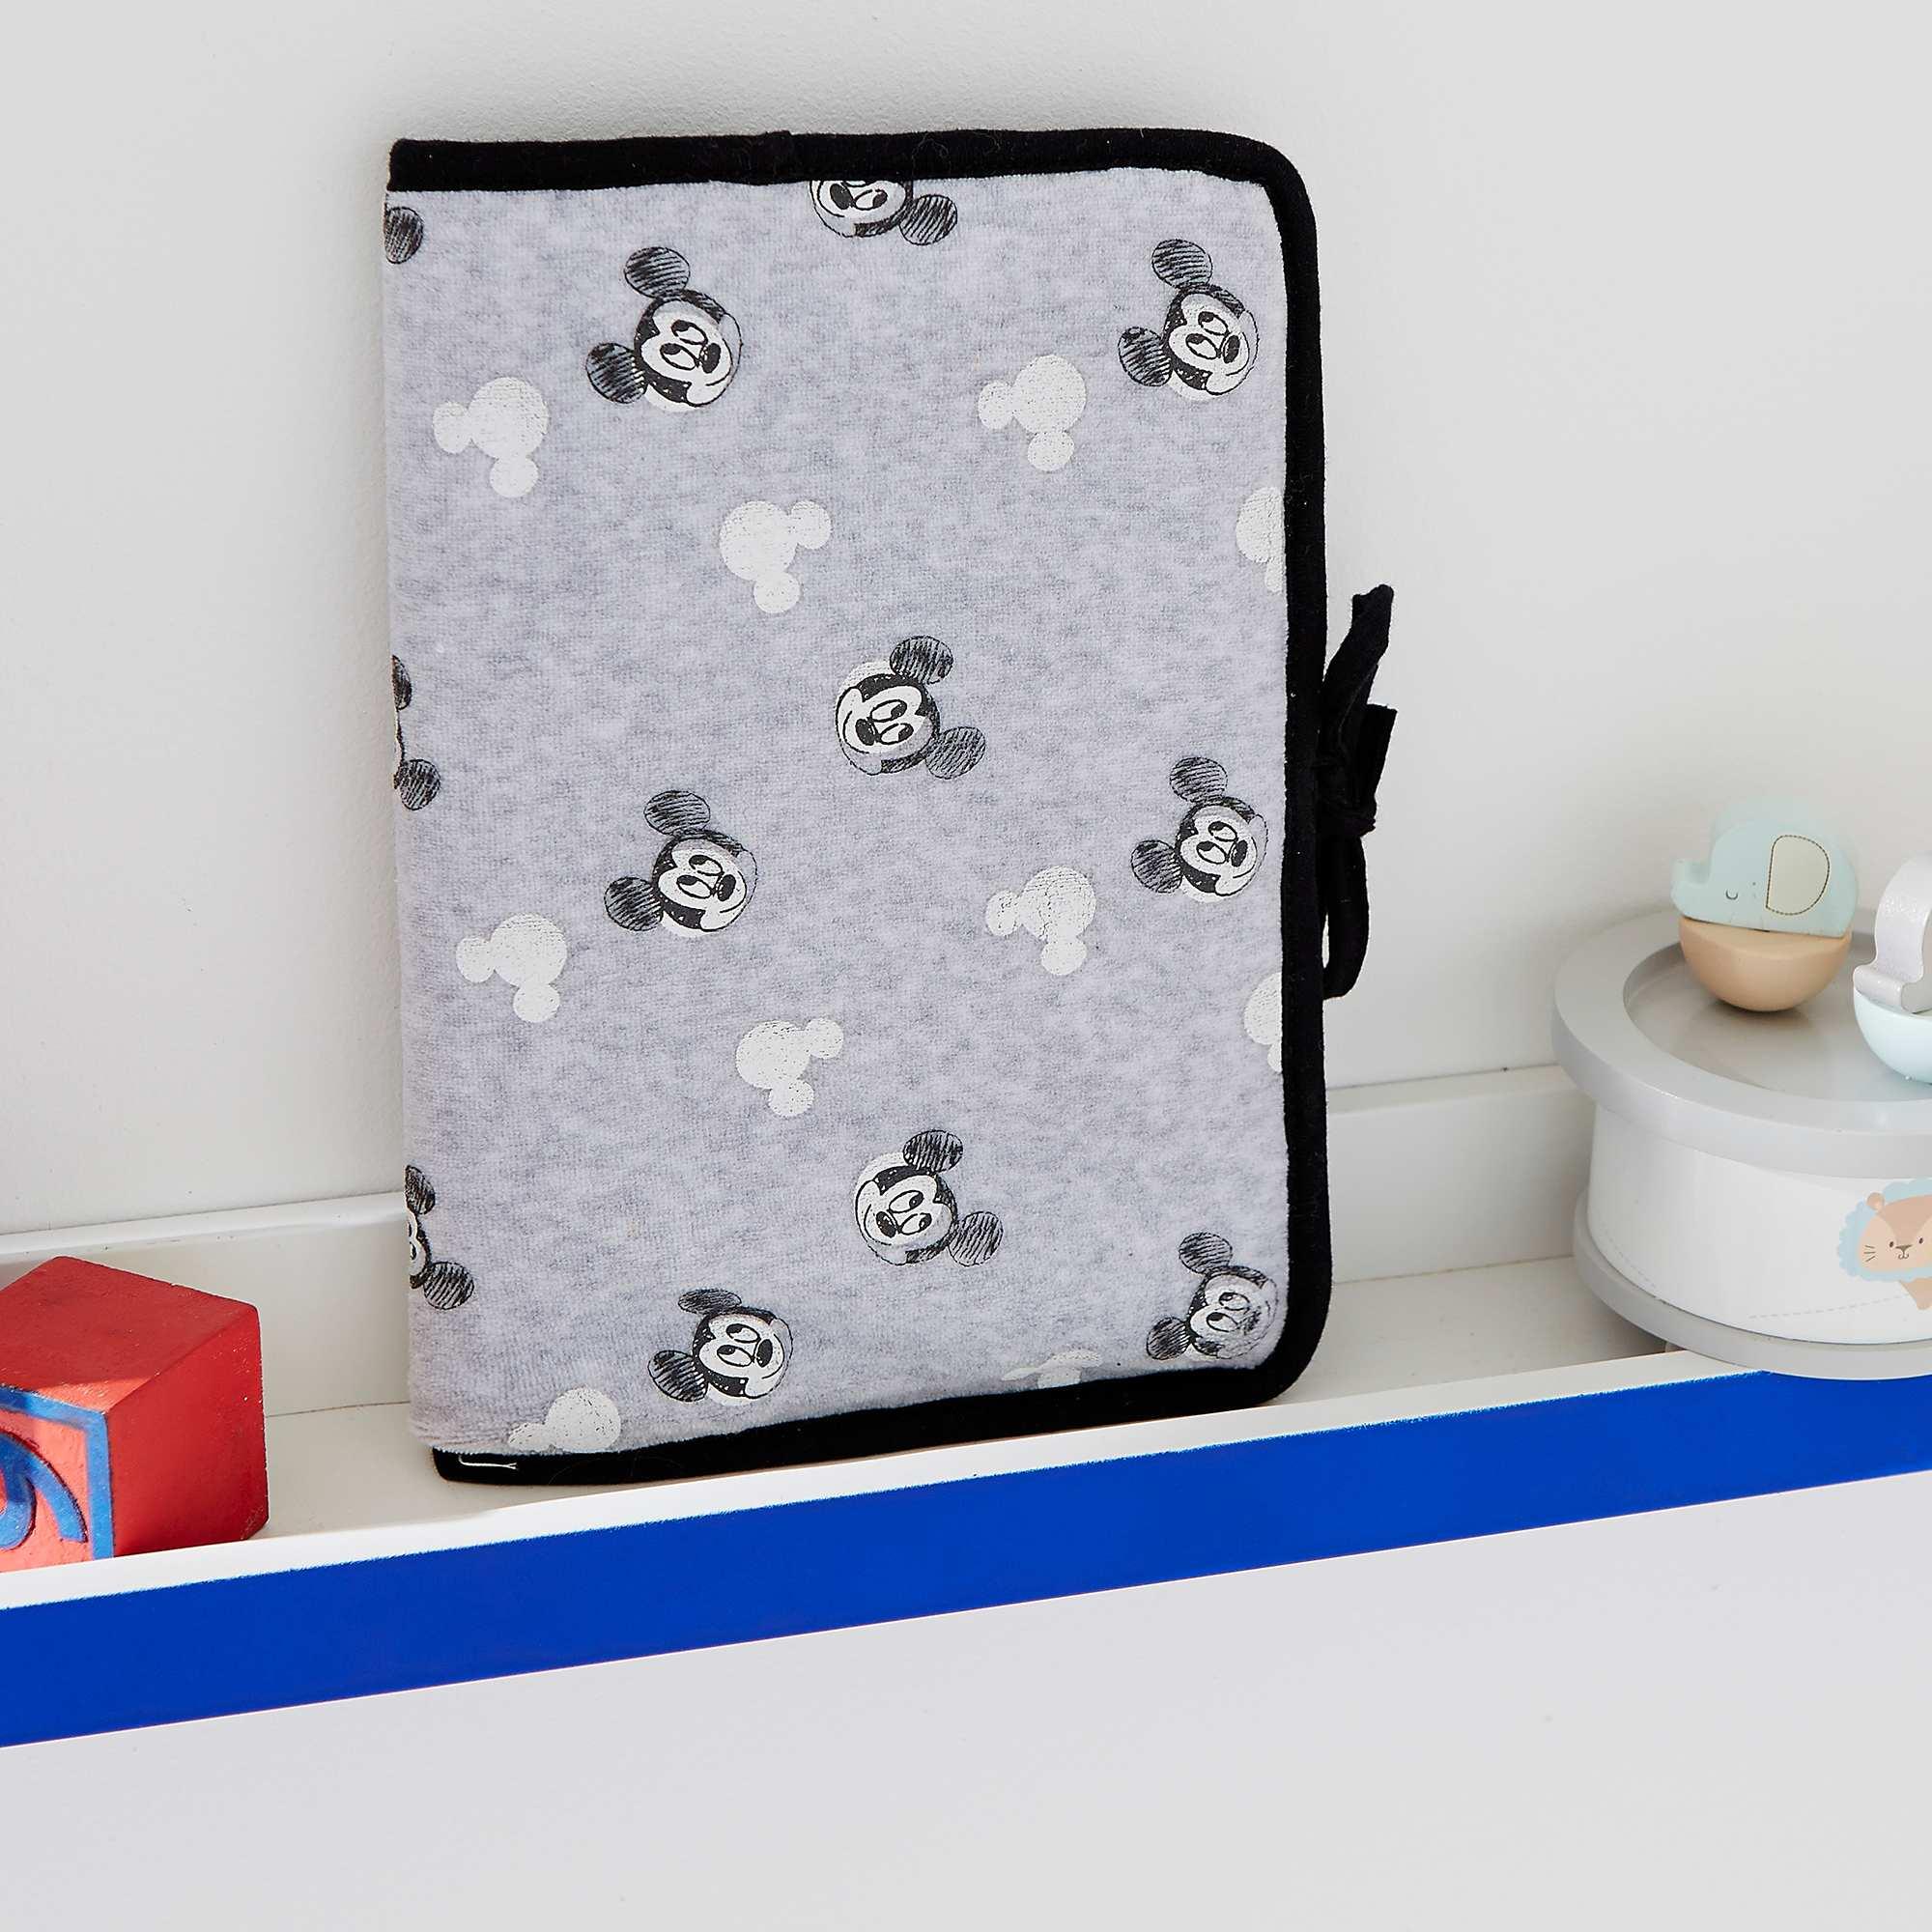 Porta libretto sanitario \'Mickey Mouse\' Neonato - blu - Kiabi - 8,00€